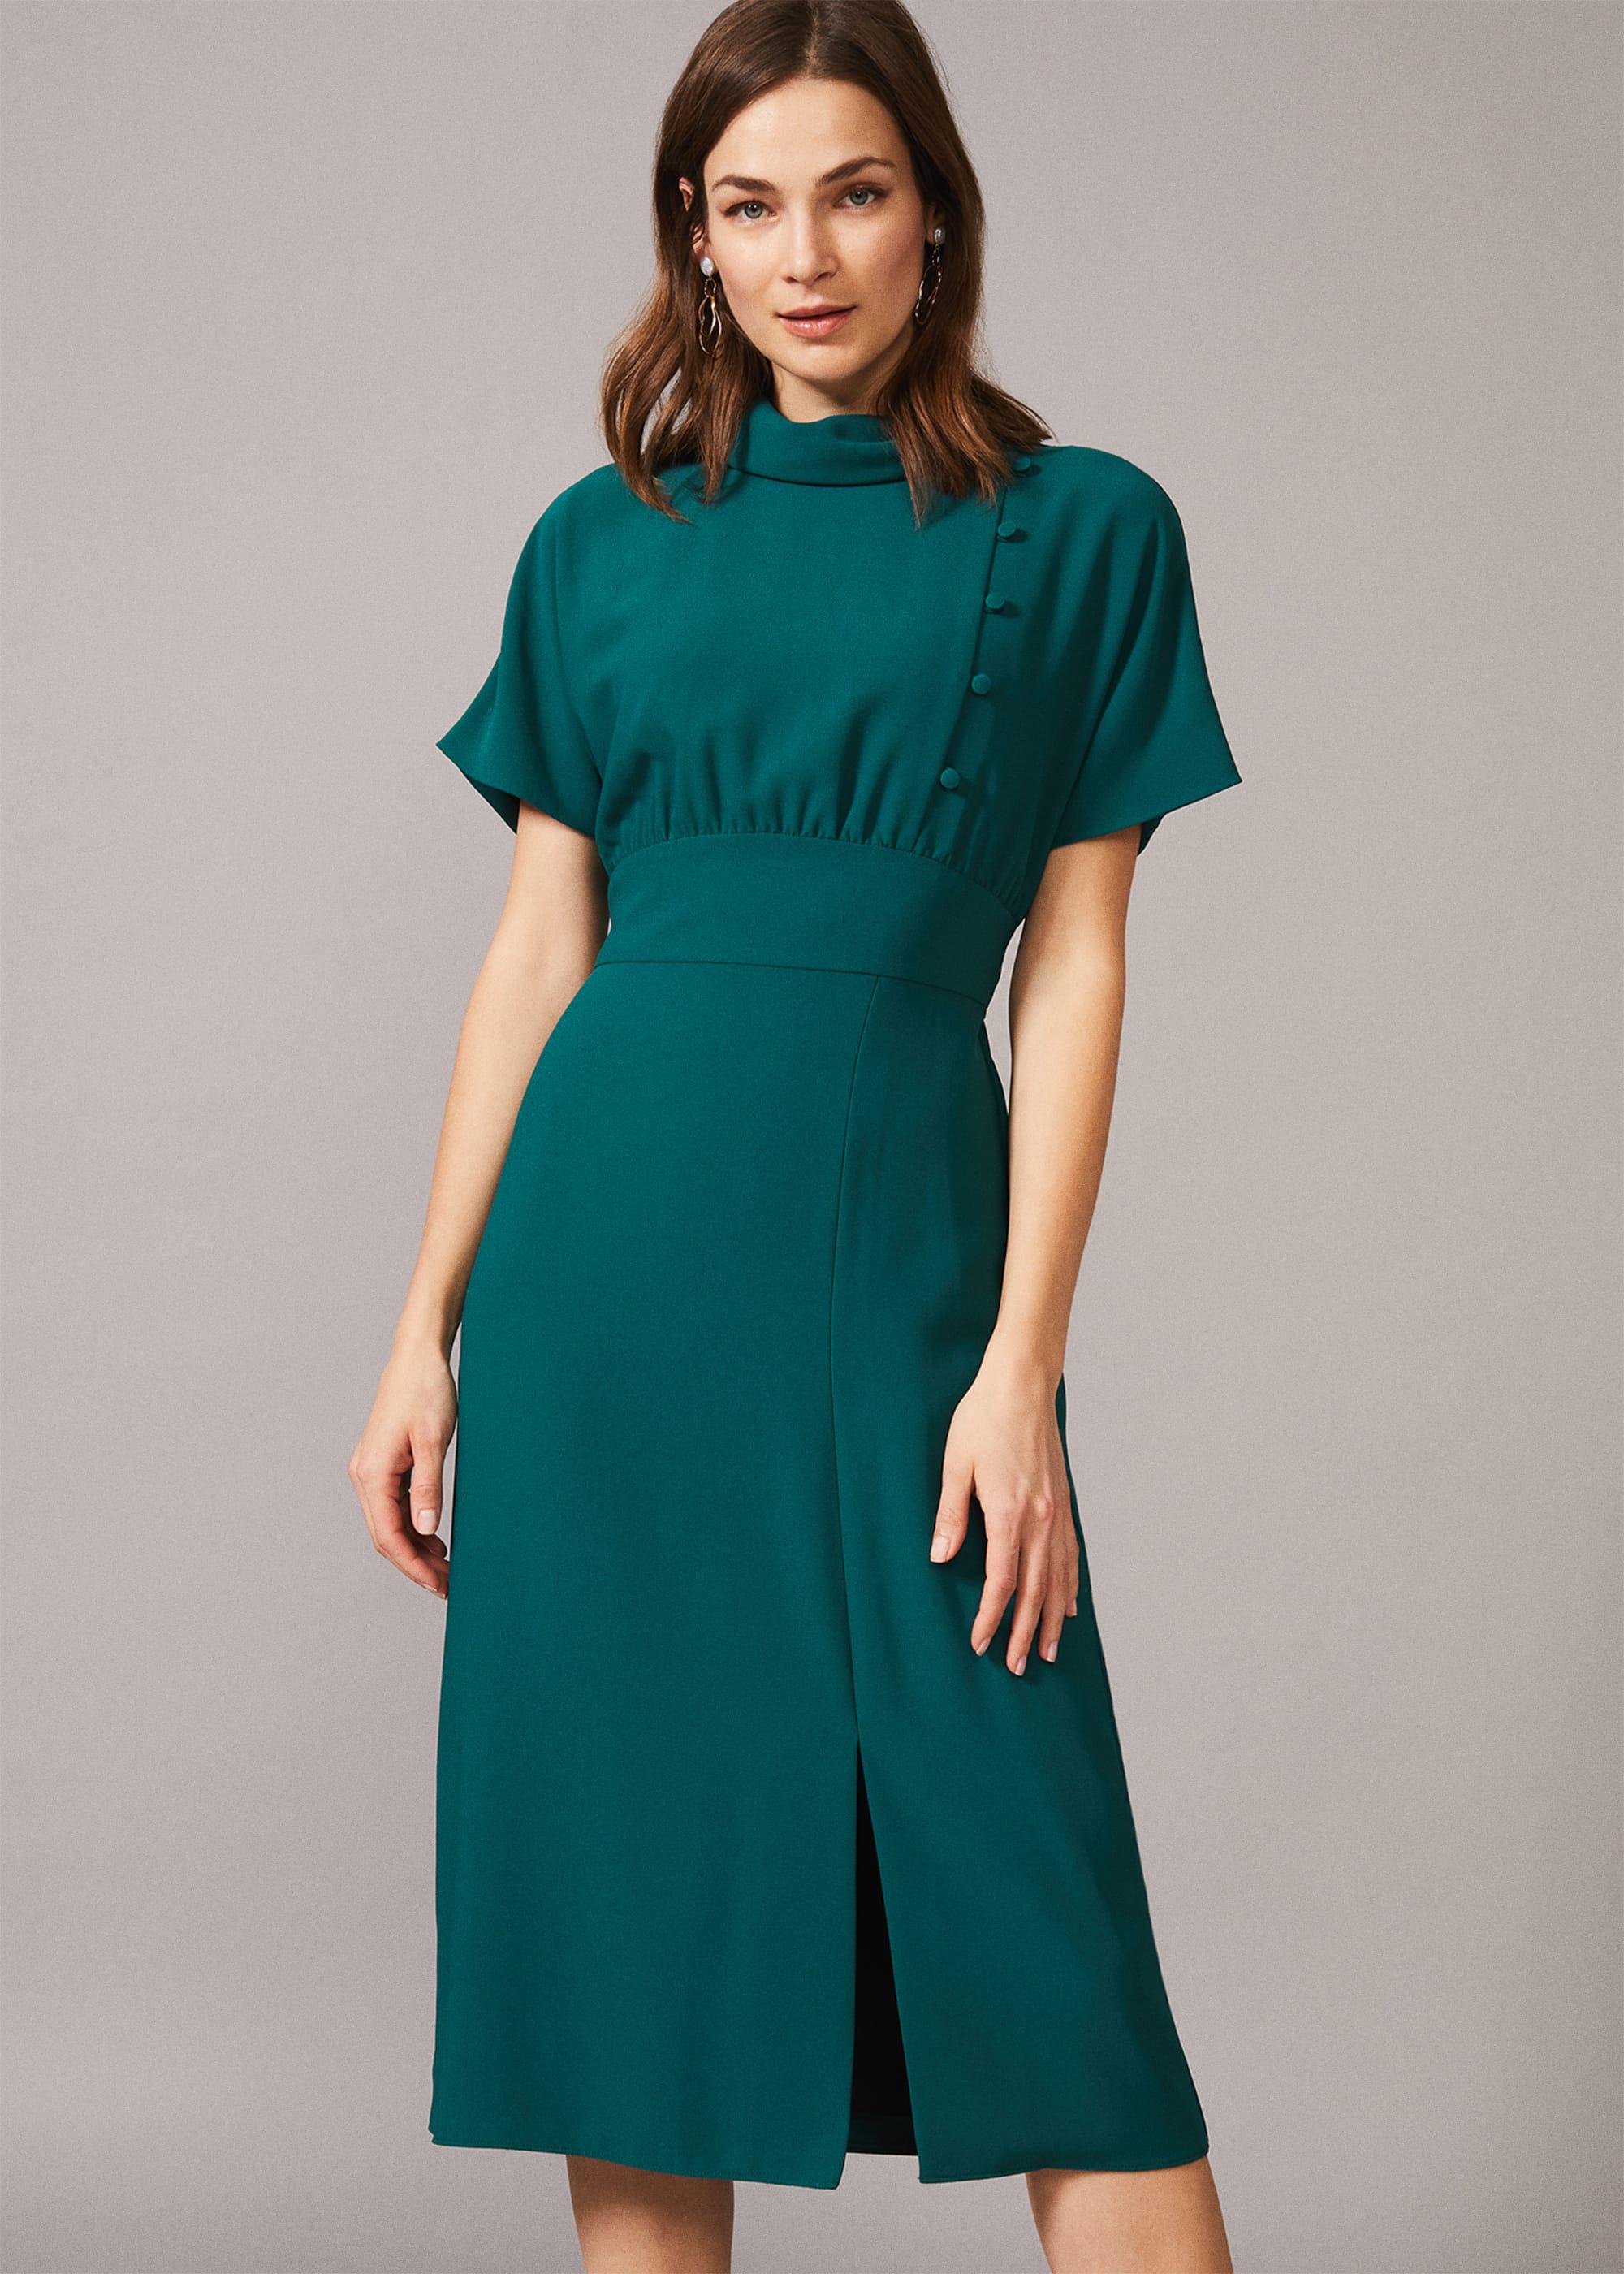 10+ Websites with 1940s Dresses for Sale Phase Eight Women Aleandra Button Detail Dress £95.00 AT vintagedancer.com